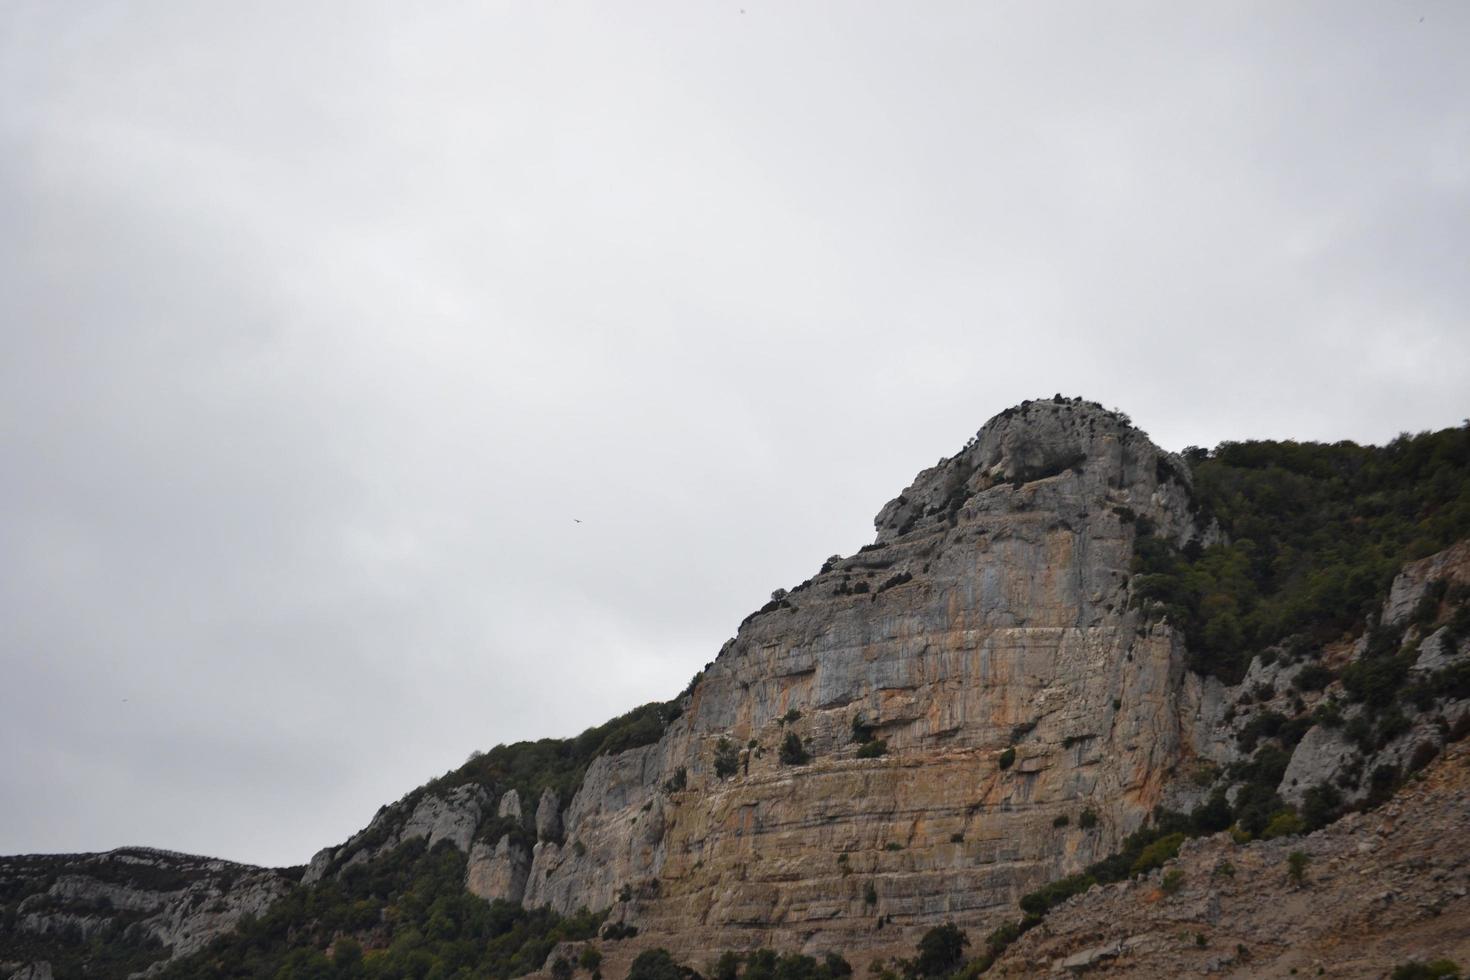 Mountain of rocks near the Monastery of Leyre photo